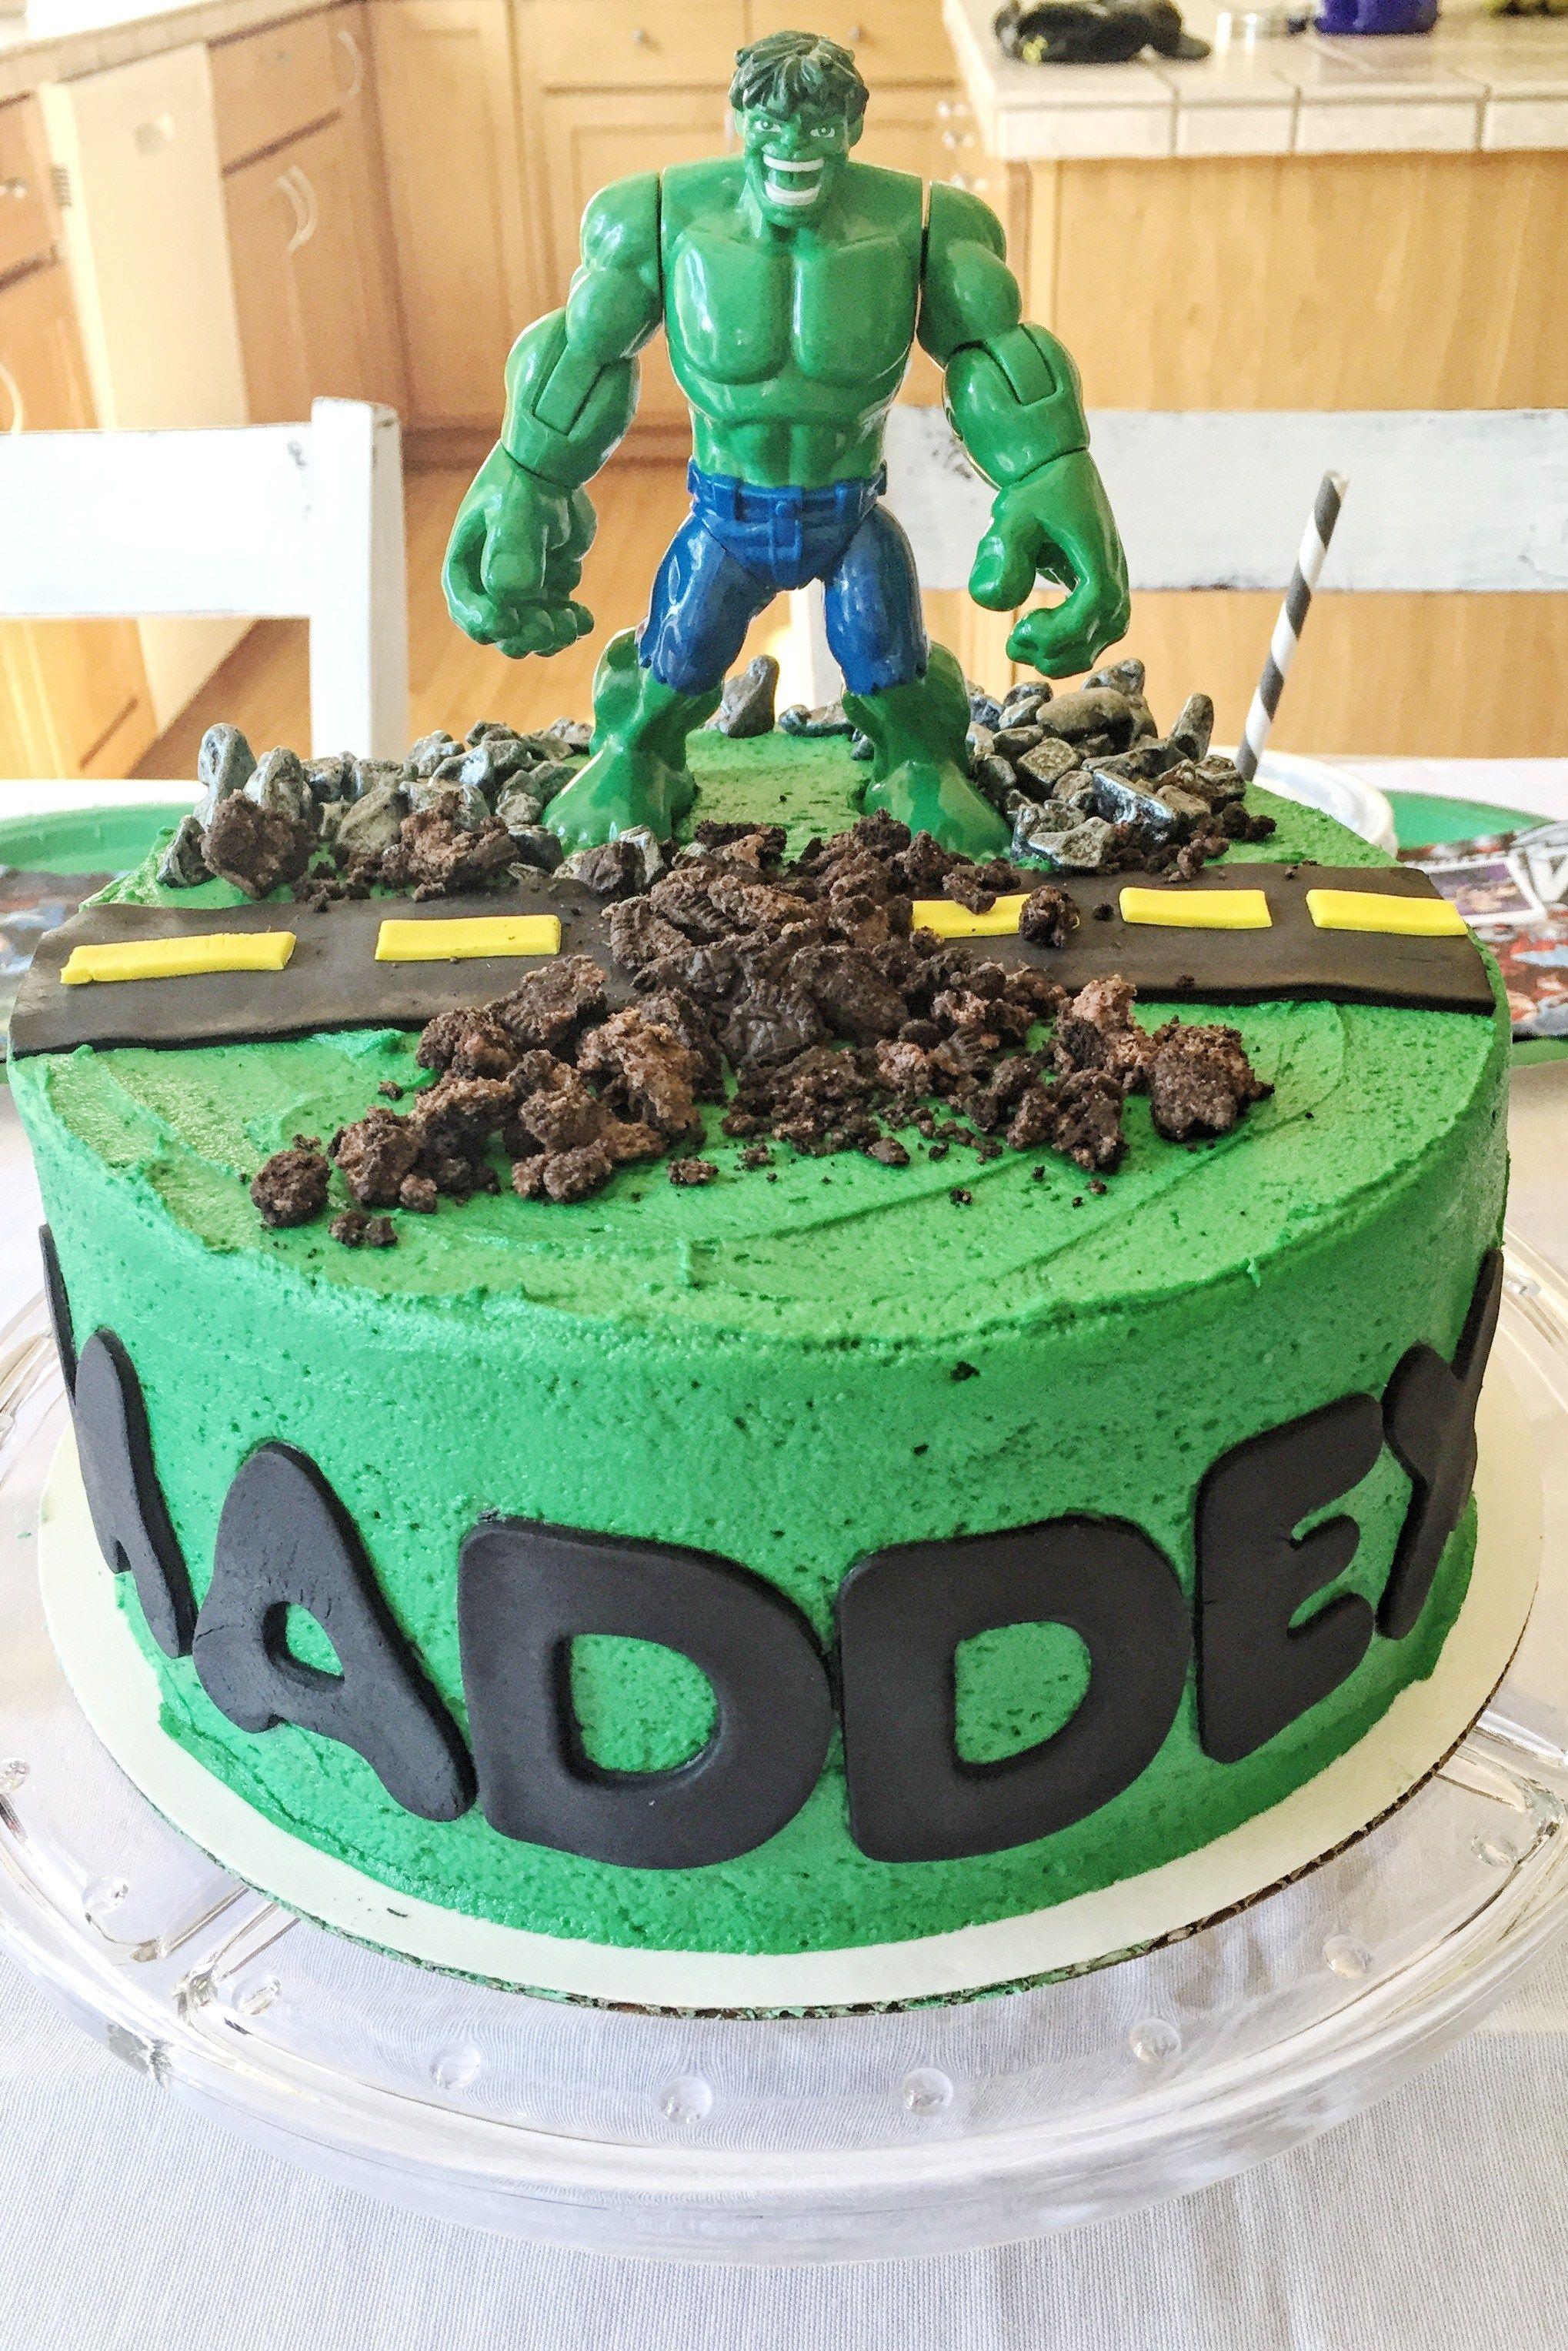 Incredible Hulk Cake With Images Hulk Cakes Incredible Hulk